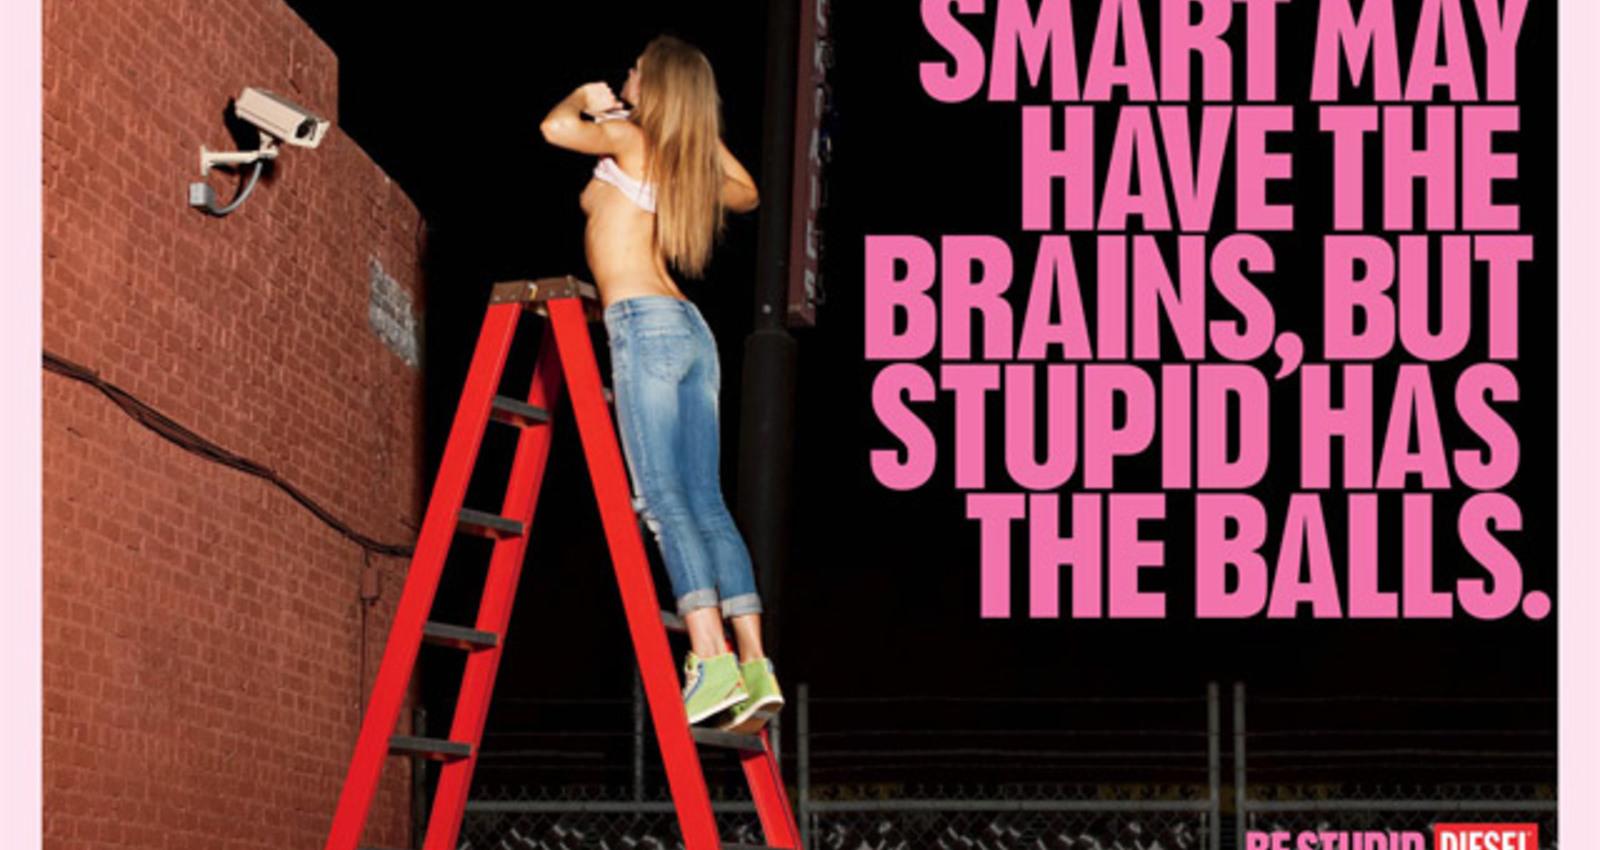 Be Stupid (Image)